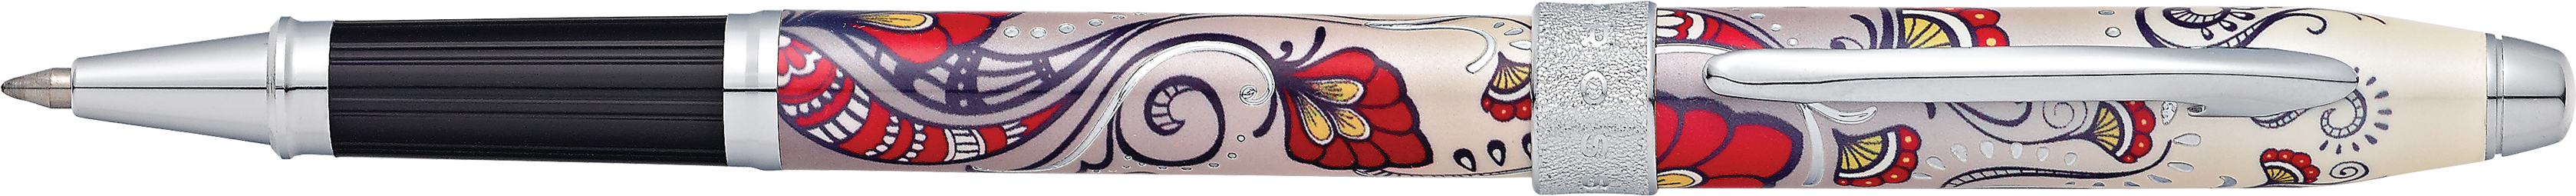 Botanica Red Hummingbird Vine Rollerball Pen